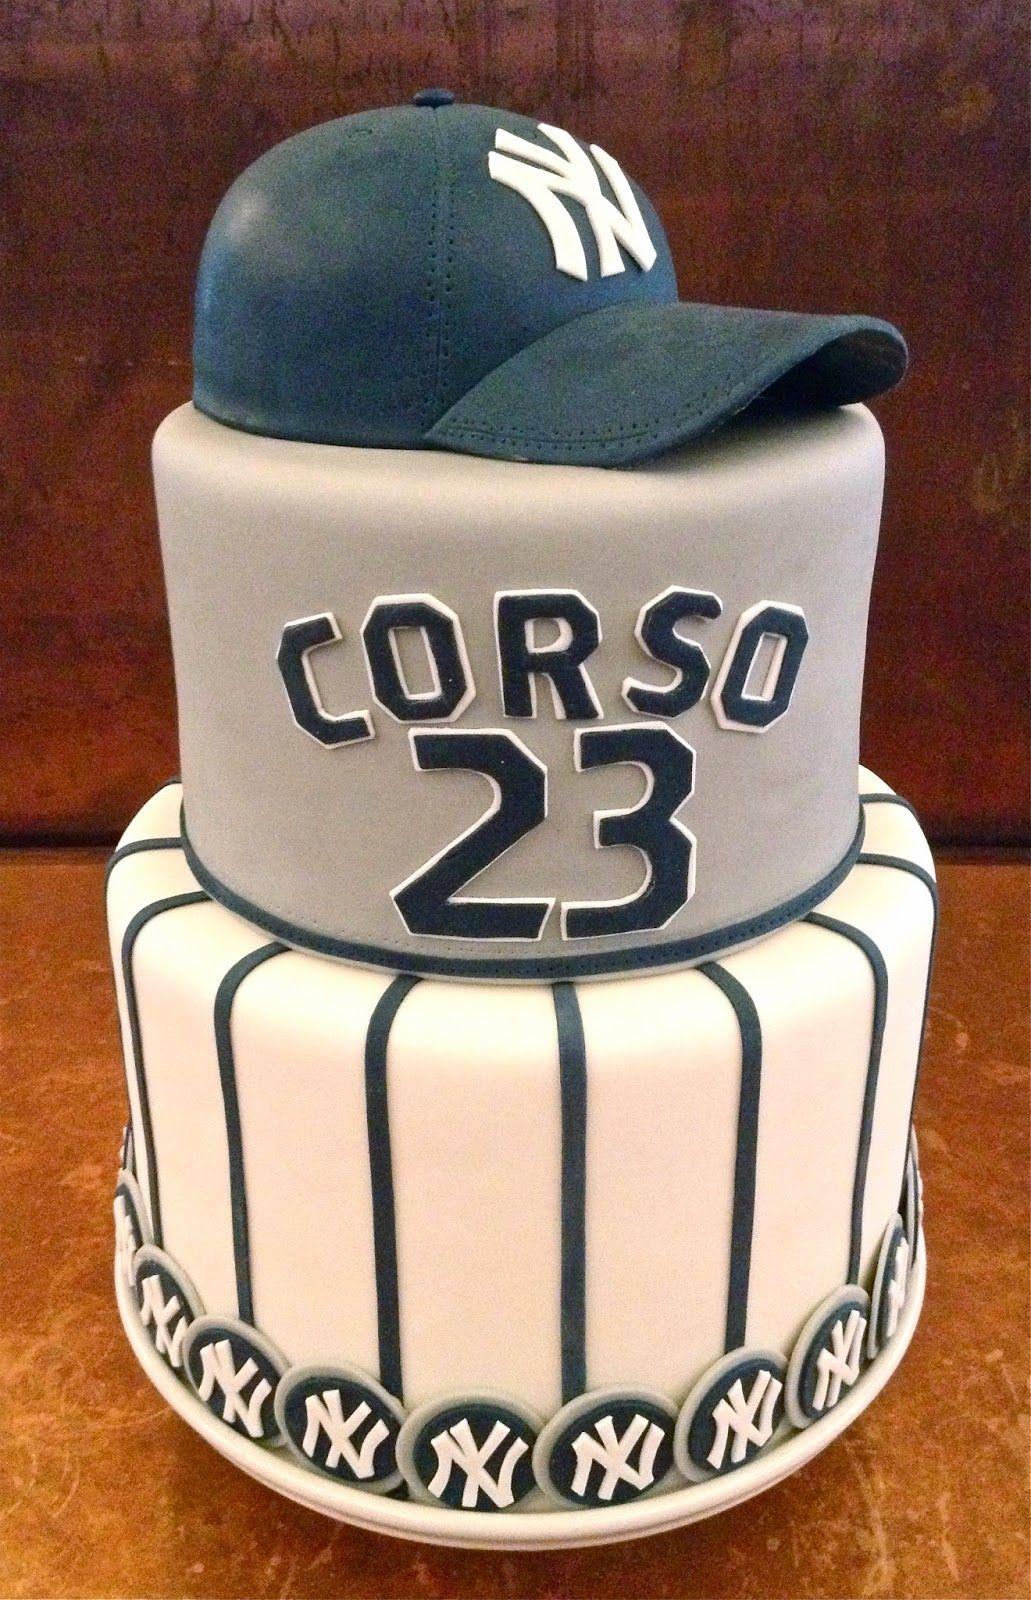 Yankees Baseball Hat Cake Cake Deco Ideas Pinterest Hat cake